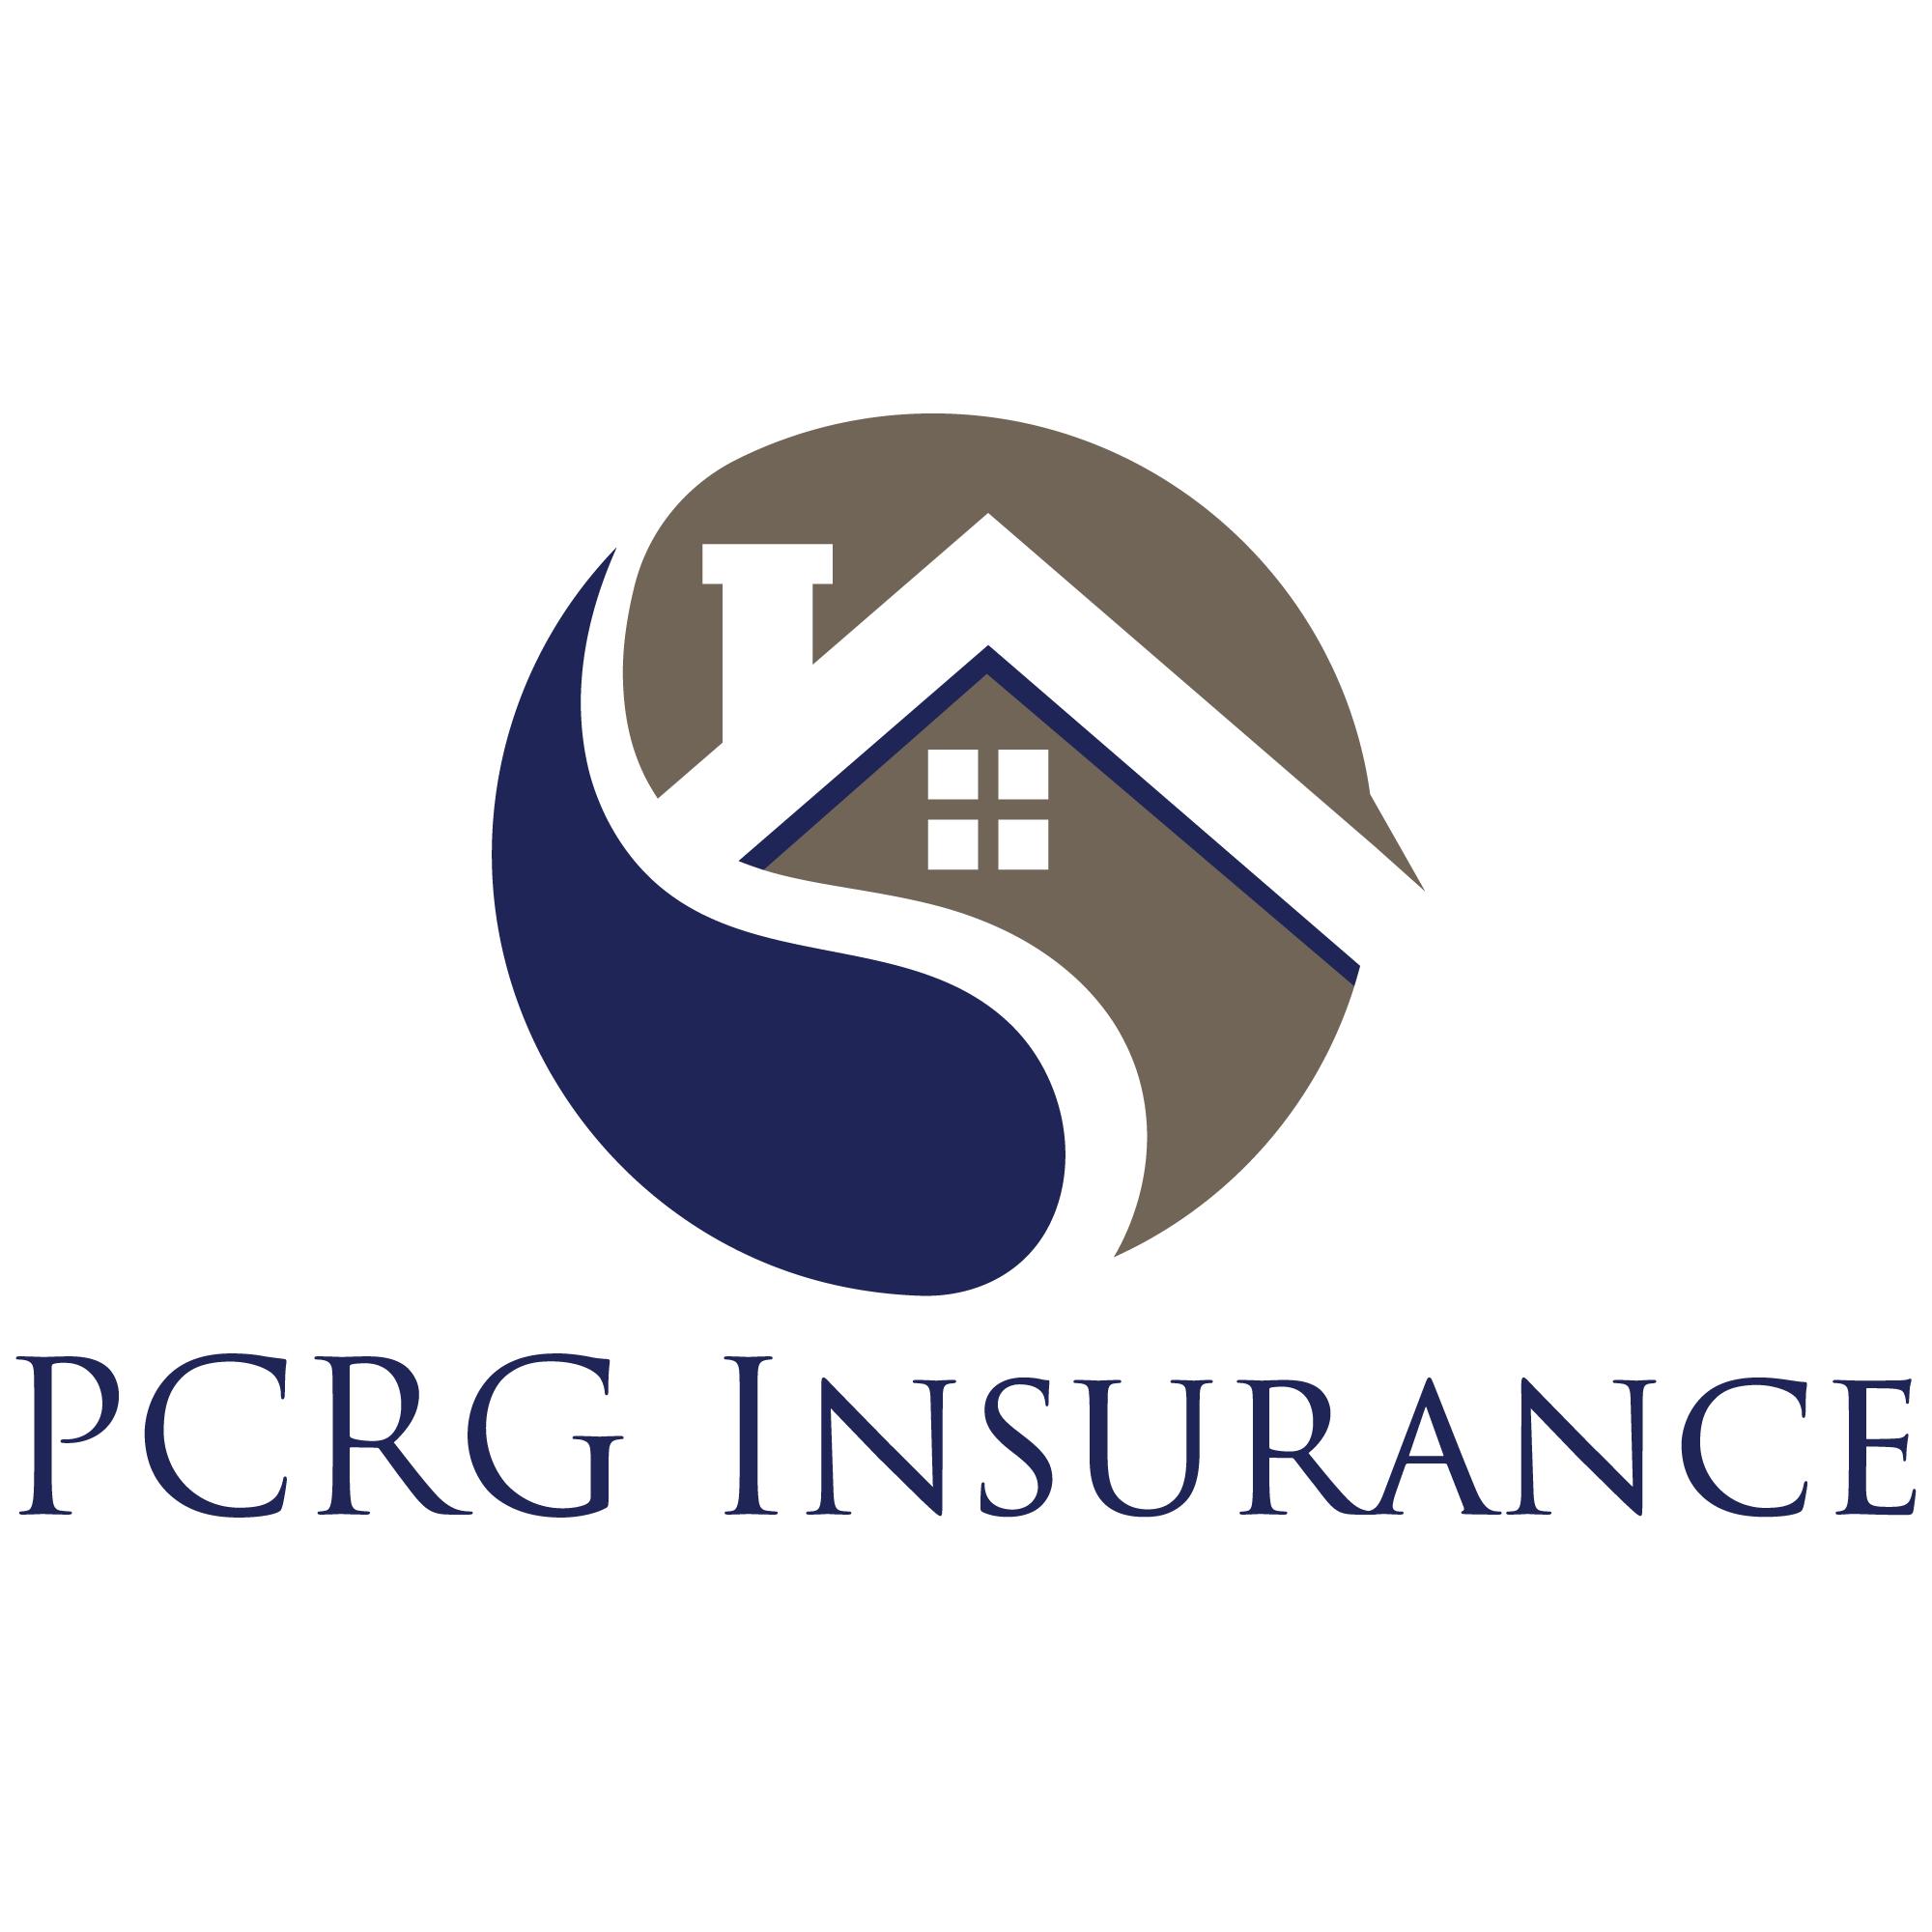 PCRG Insurance image 1